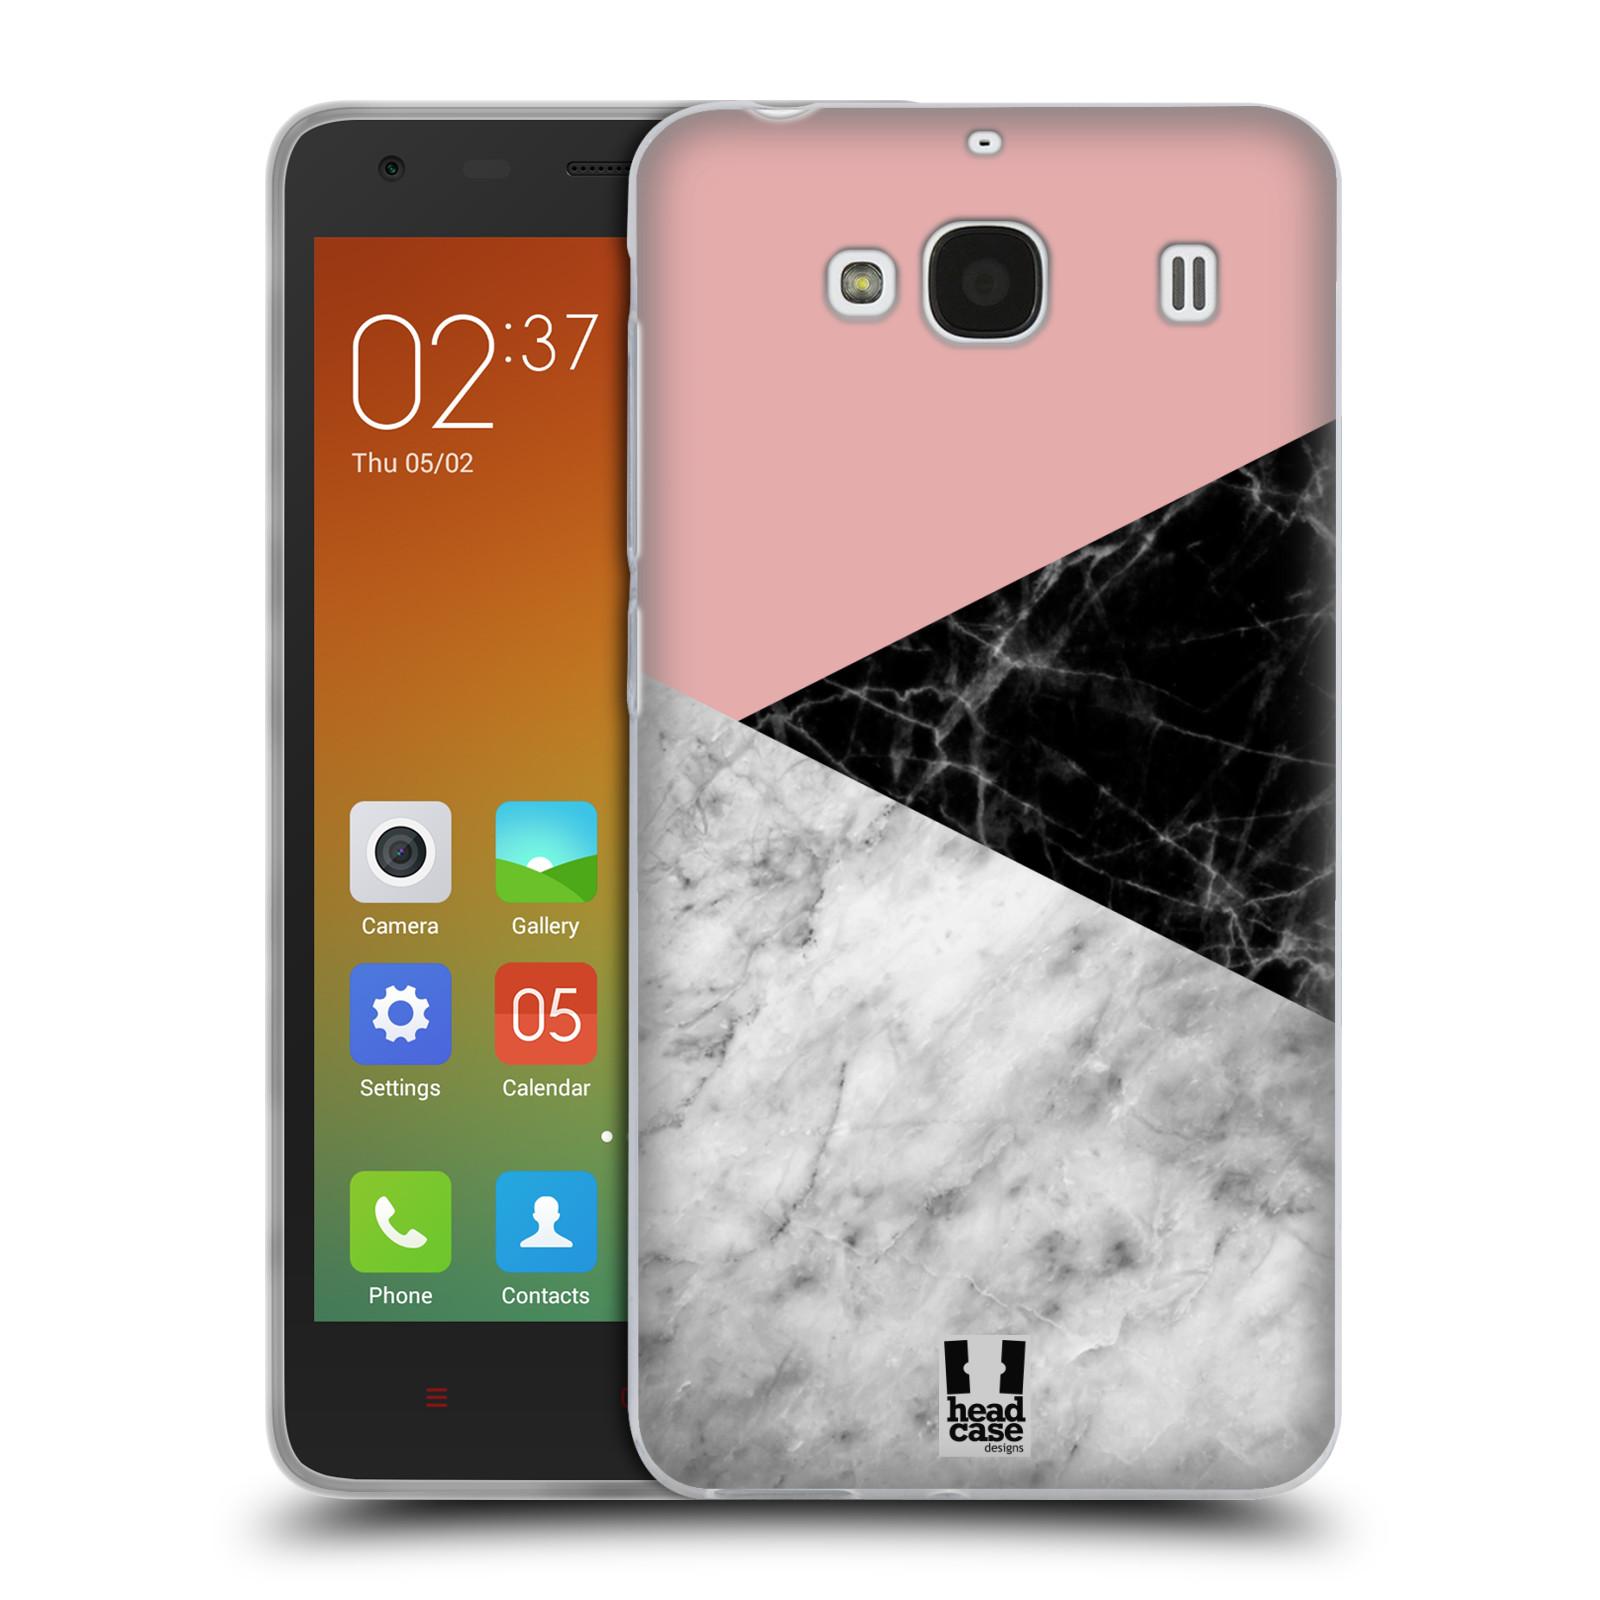 Silikonové pouzdro na mobil Xiaomi Redmi 2 - Head Case - Mramor mix